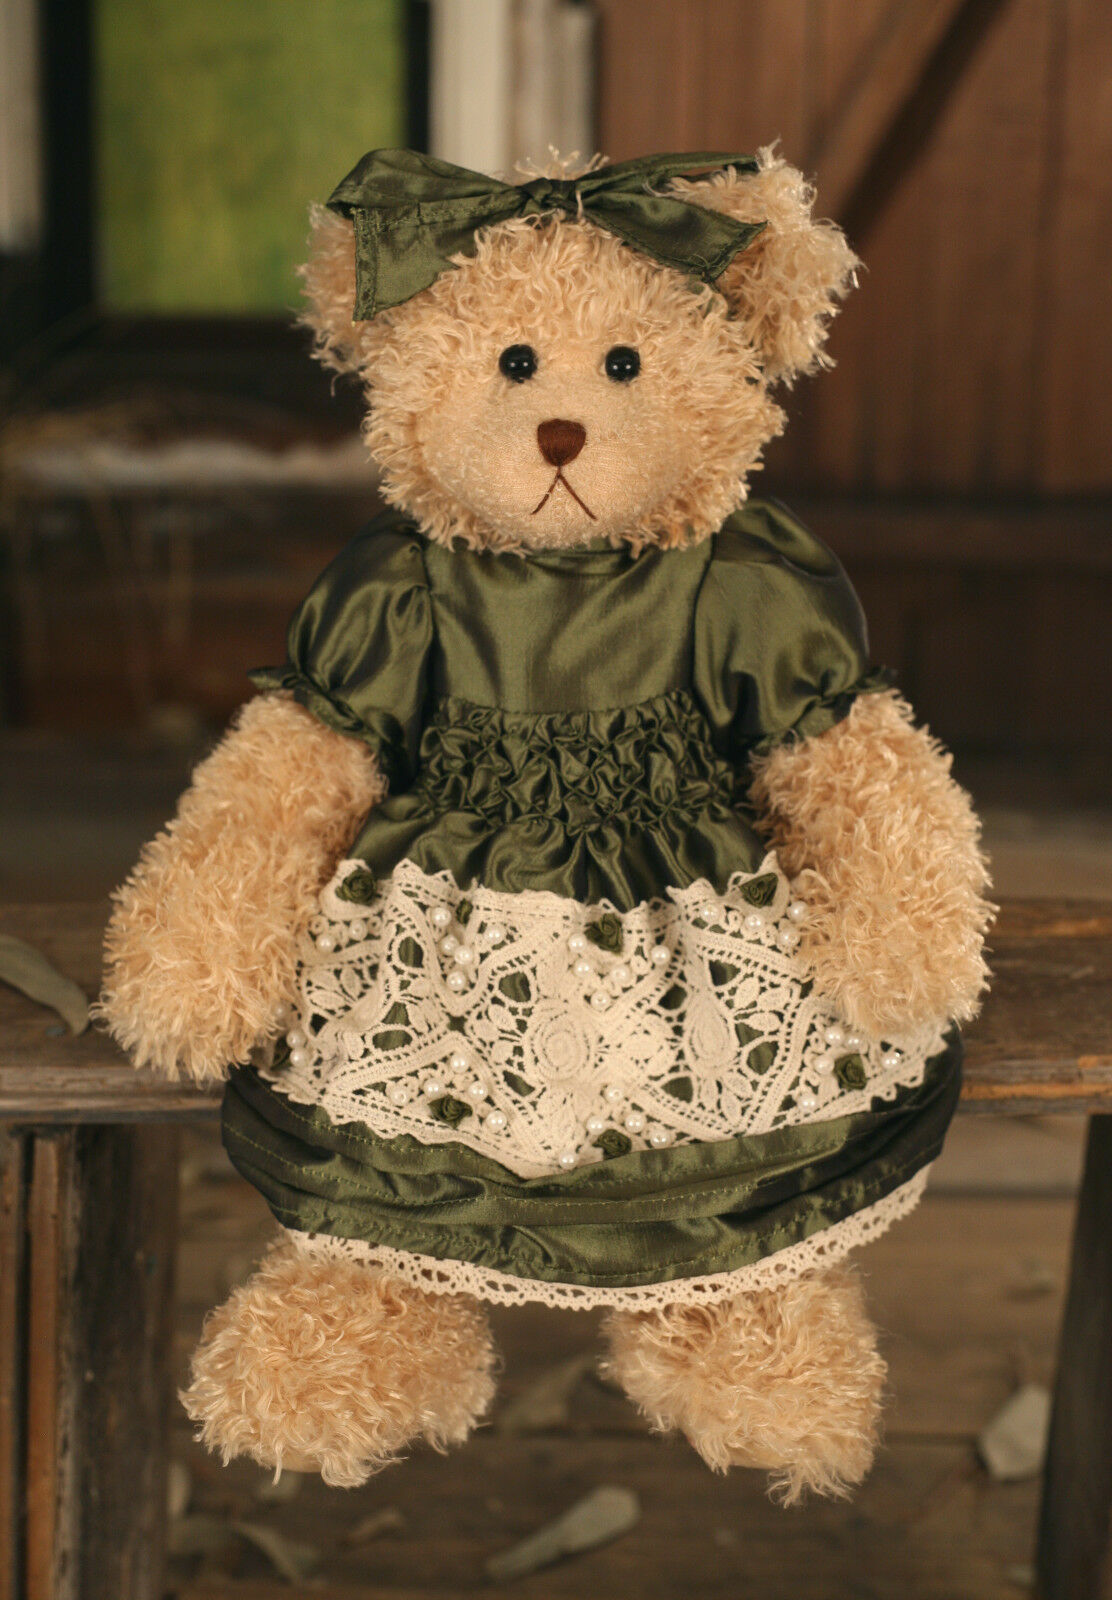 Teddy Bear 'Abbey' Settler Bears Handmade verde Gift Collectable 38cms BRAND NEW